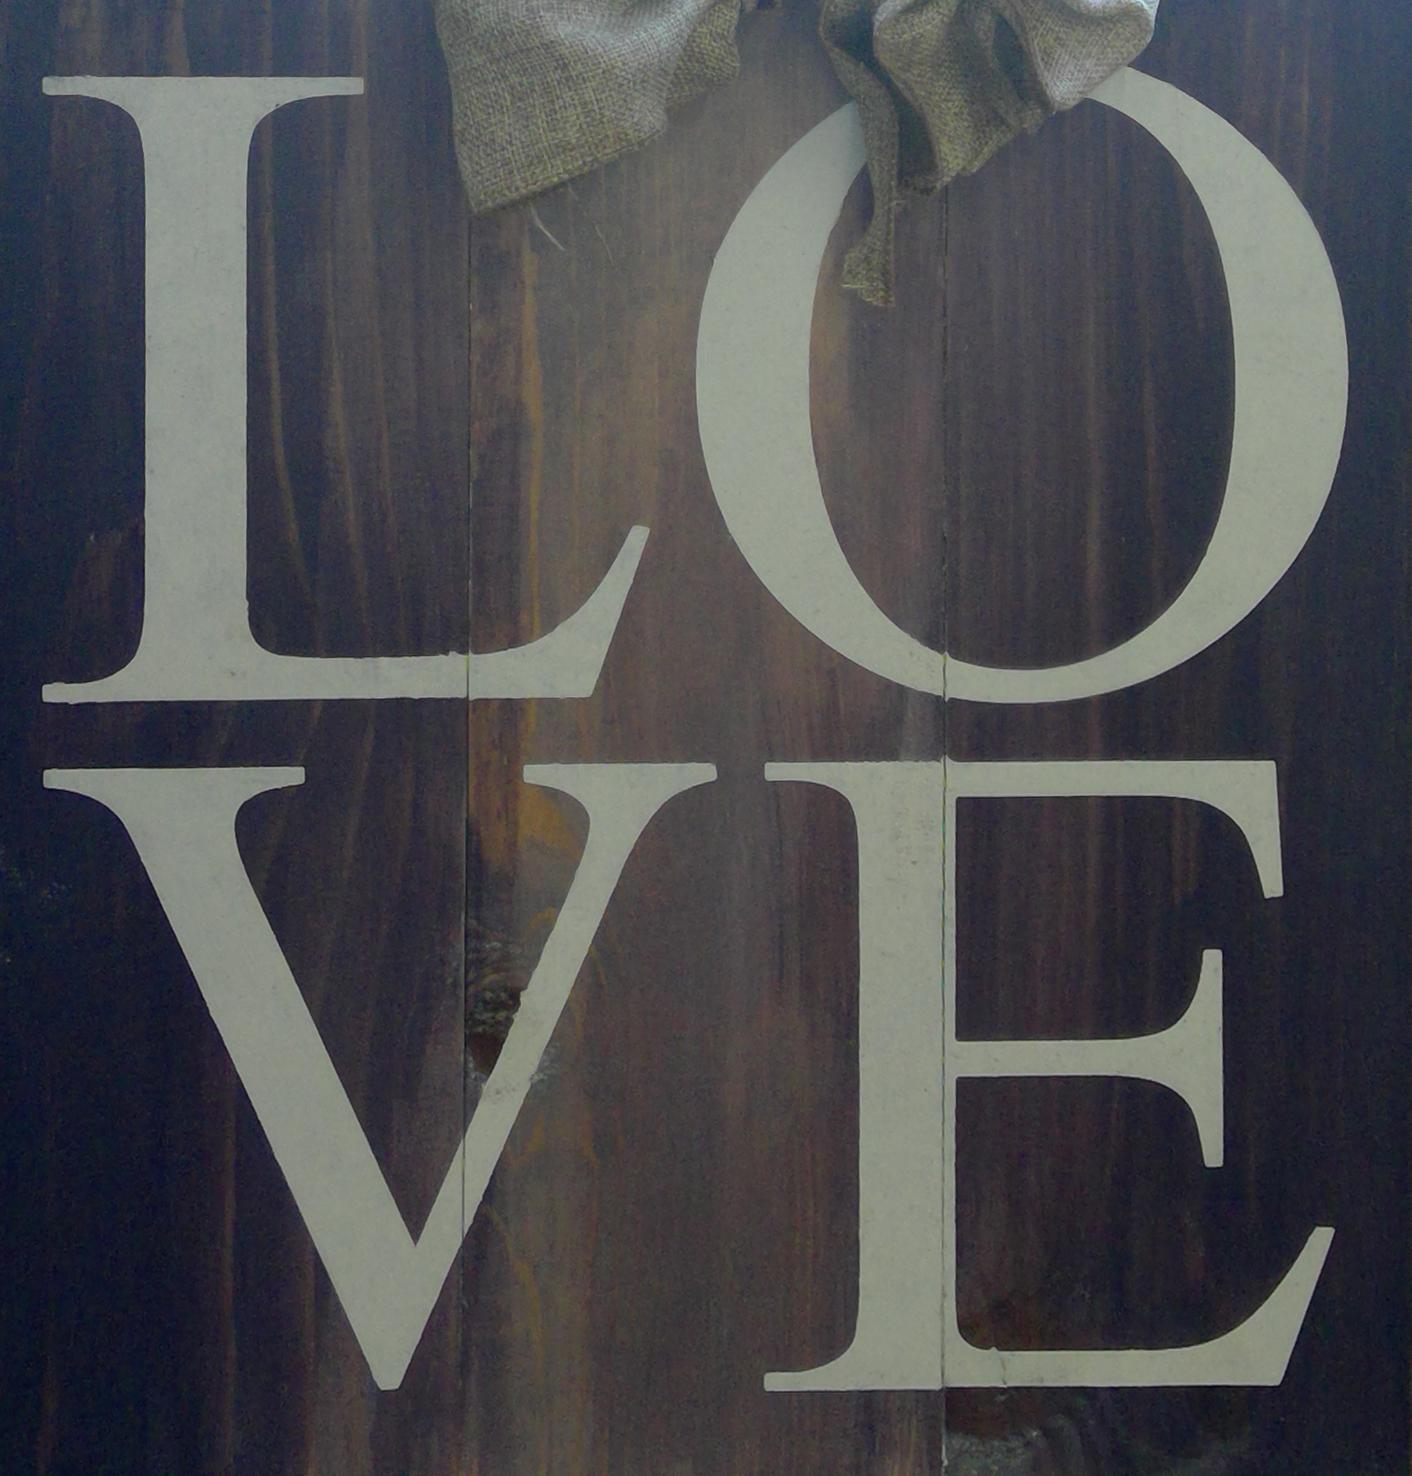 #55 LOVE